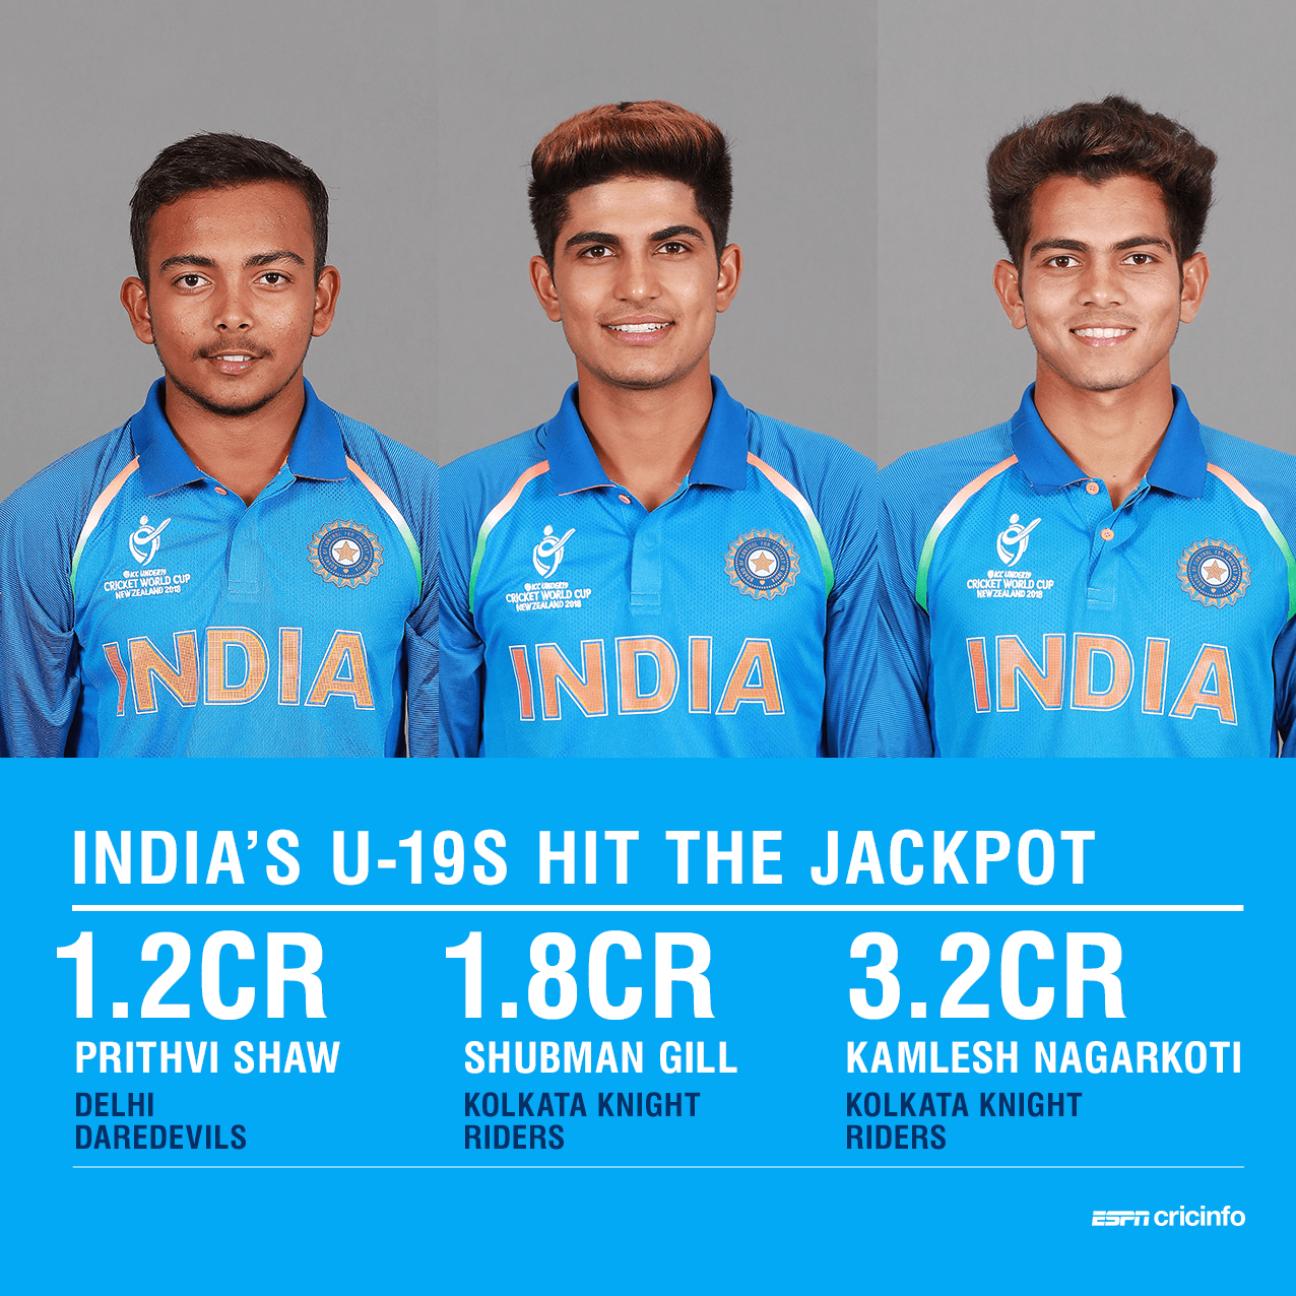 Prithvi Shaw, Shubman Gill and Kamlesh Nagarkoti went for big money at the 2018 IPL auction